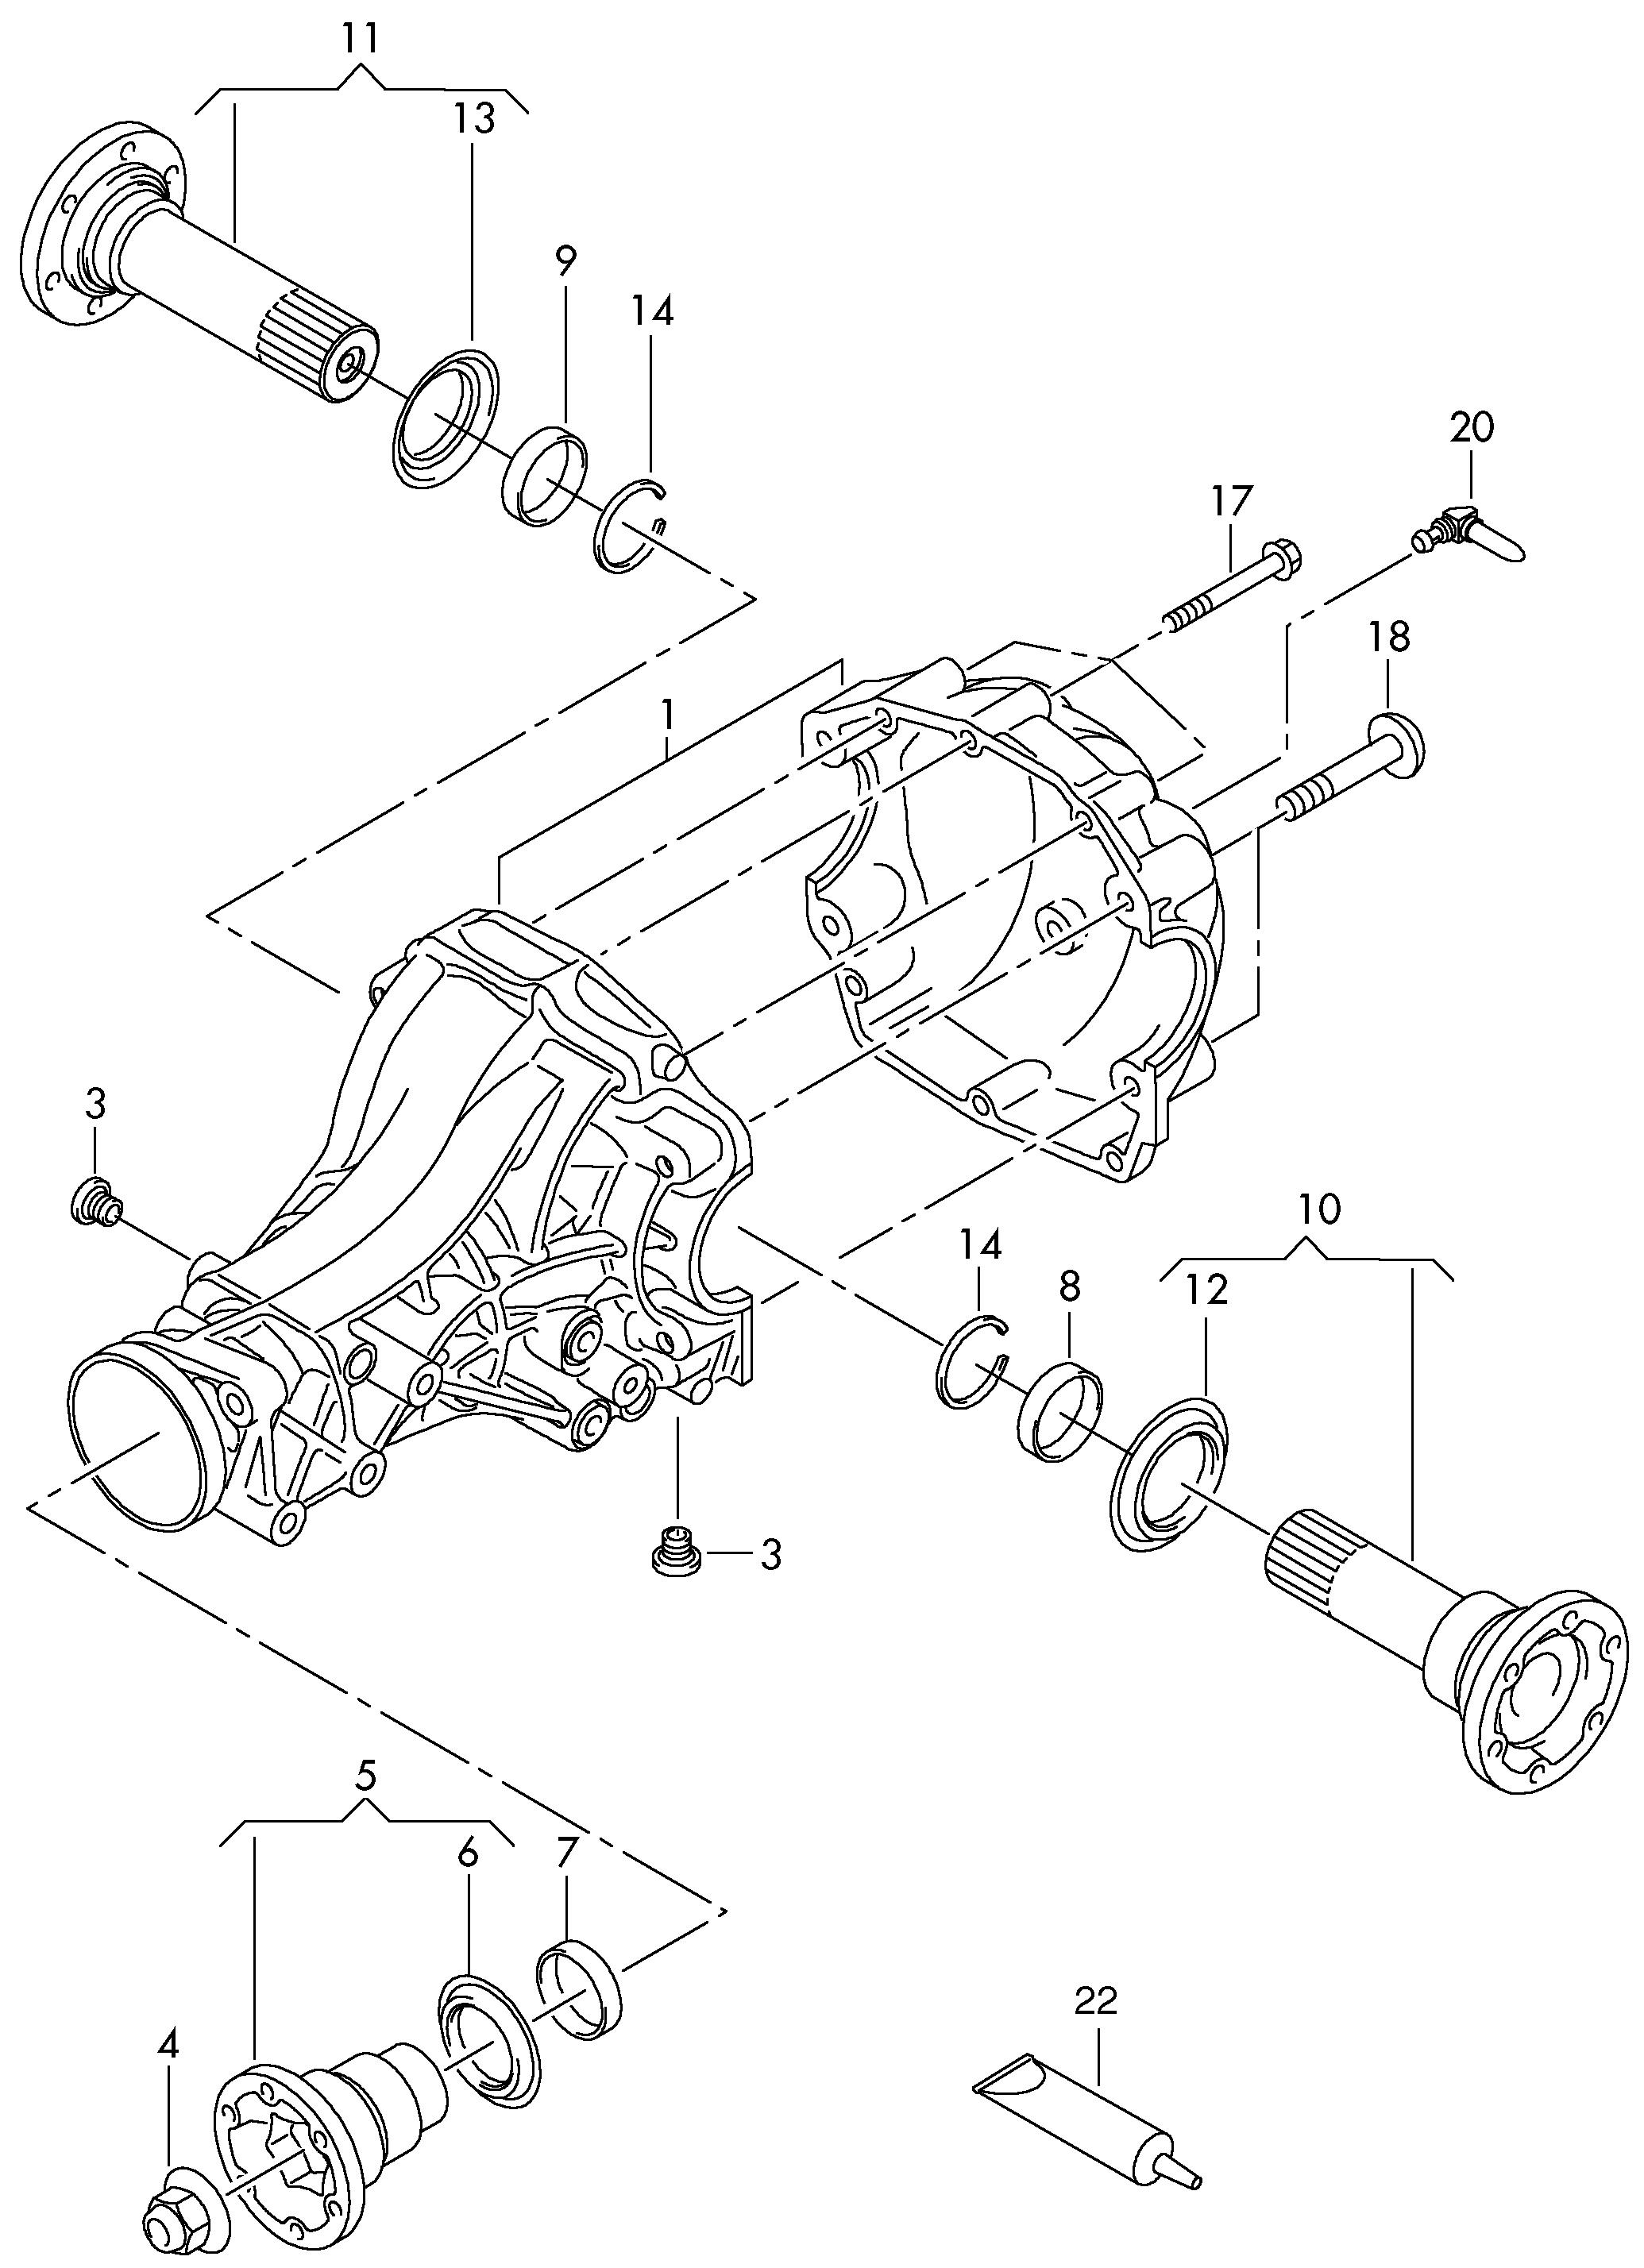 Audi Q5 2013 2017 Flanged Shaft Rear Axle Housing Vag Etka Engine Diagram